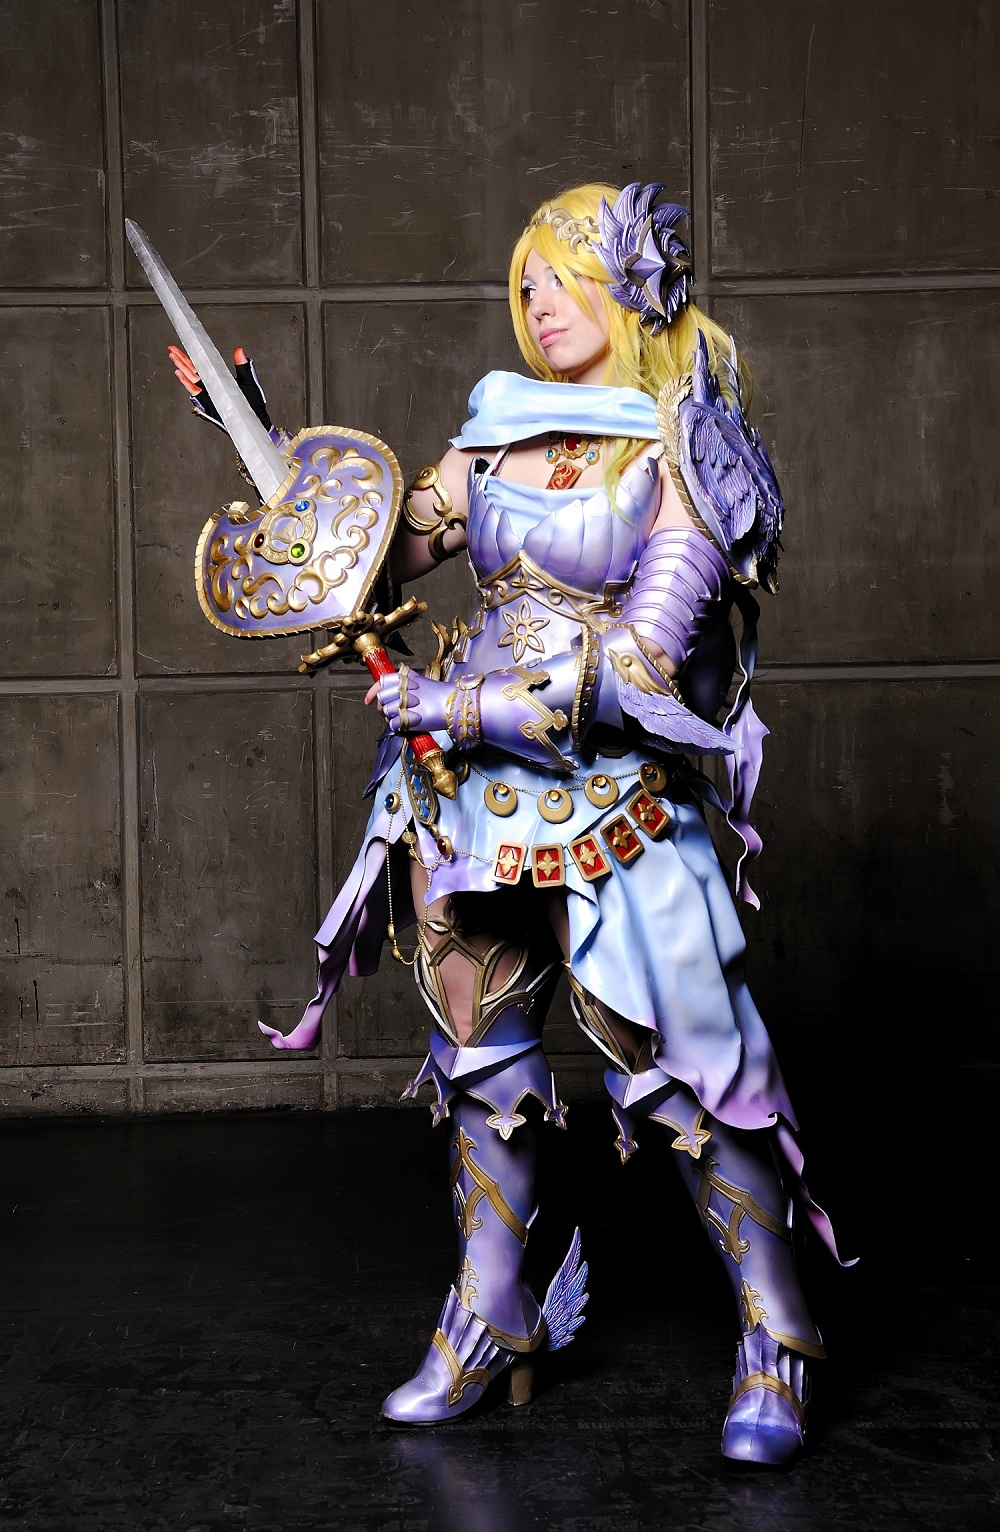 Nữ kiếm sĩ xinh đẹp trong Zangeki no Reginleiv - Ảnh 2